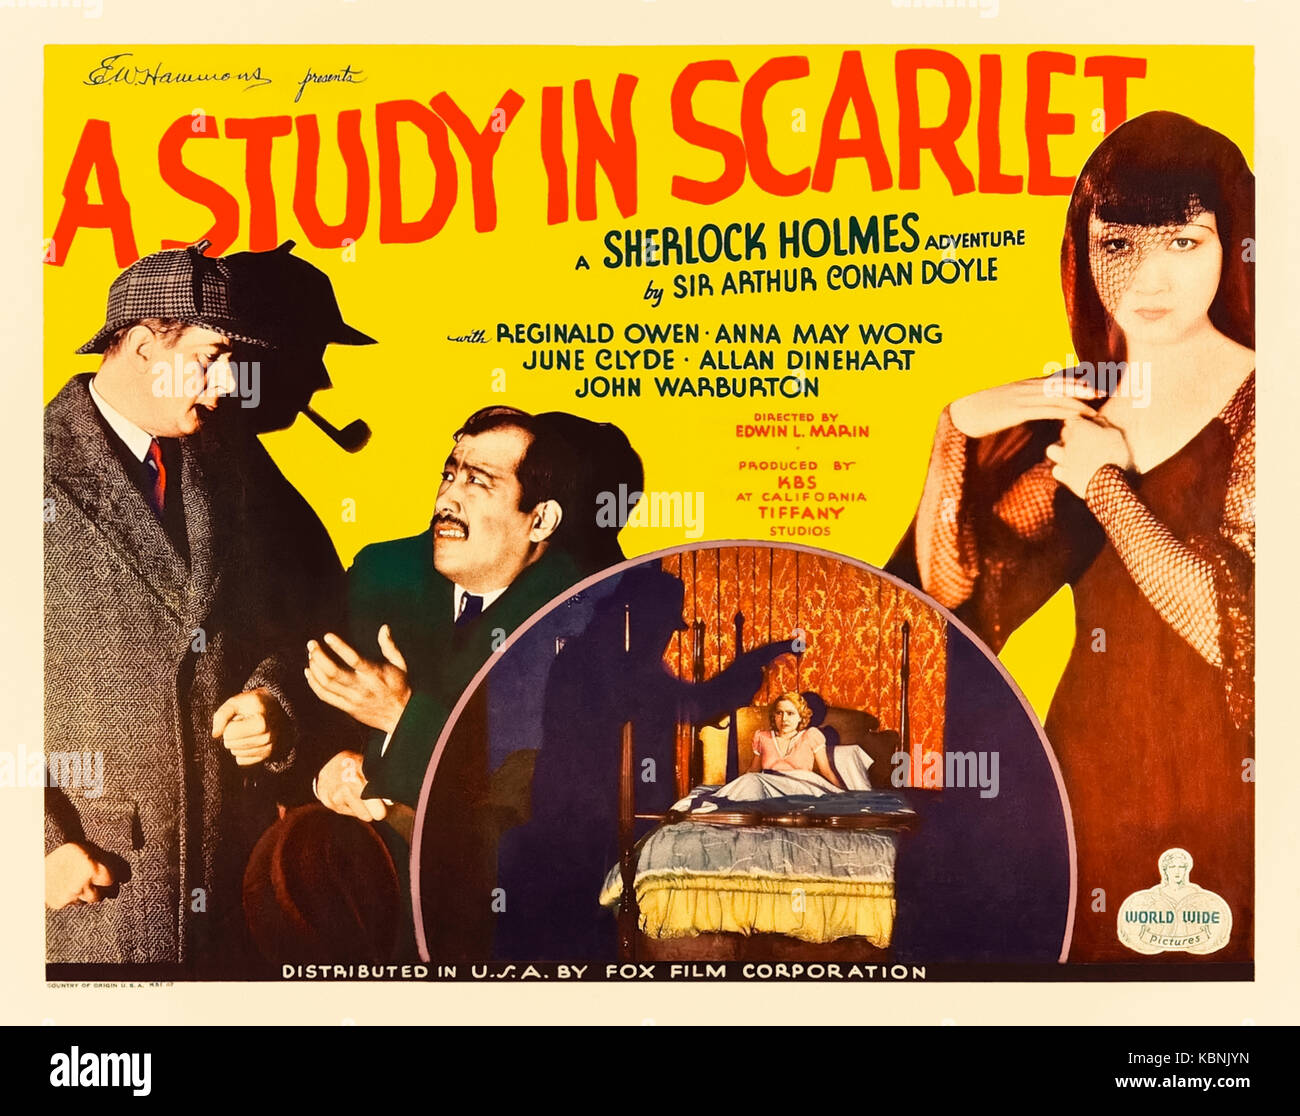 A Study in Scarlet Summary | SuperSummary